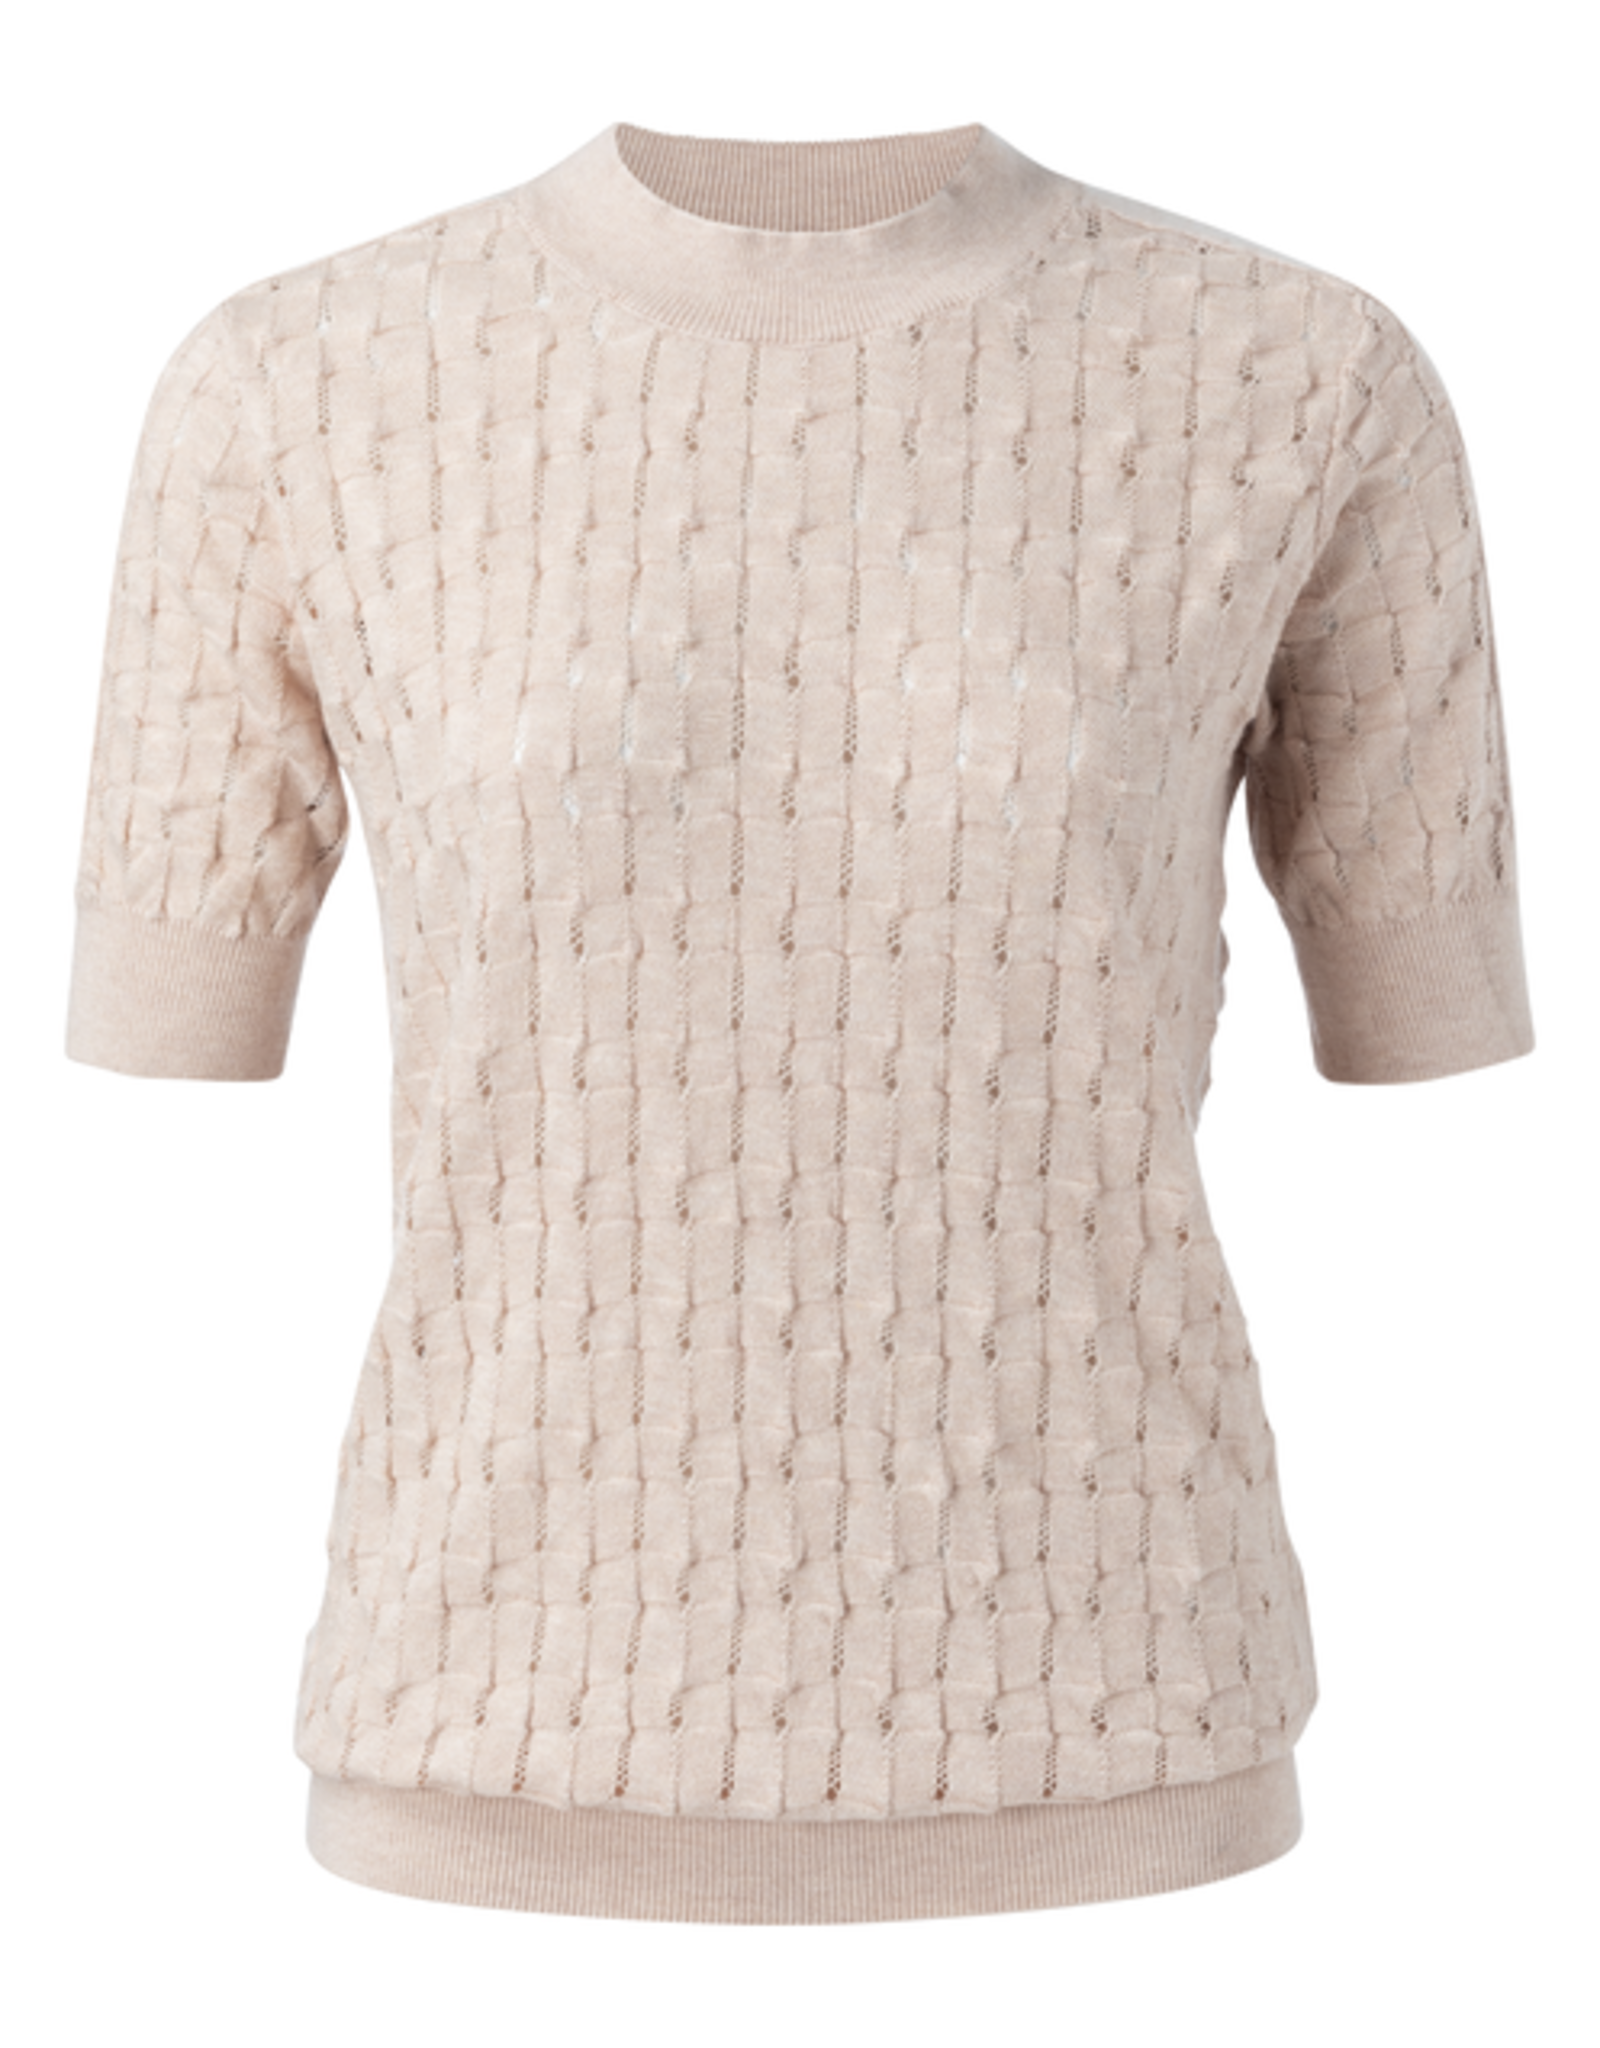 YaYa 1000322-021 Cashmere blend sweater